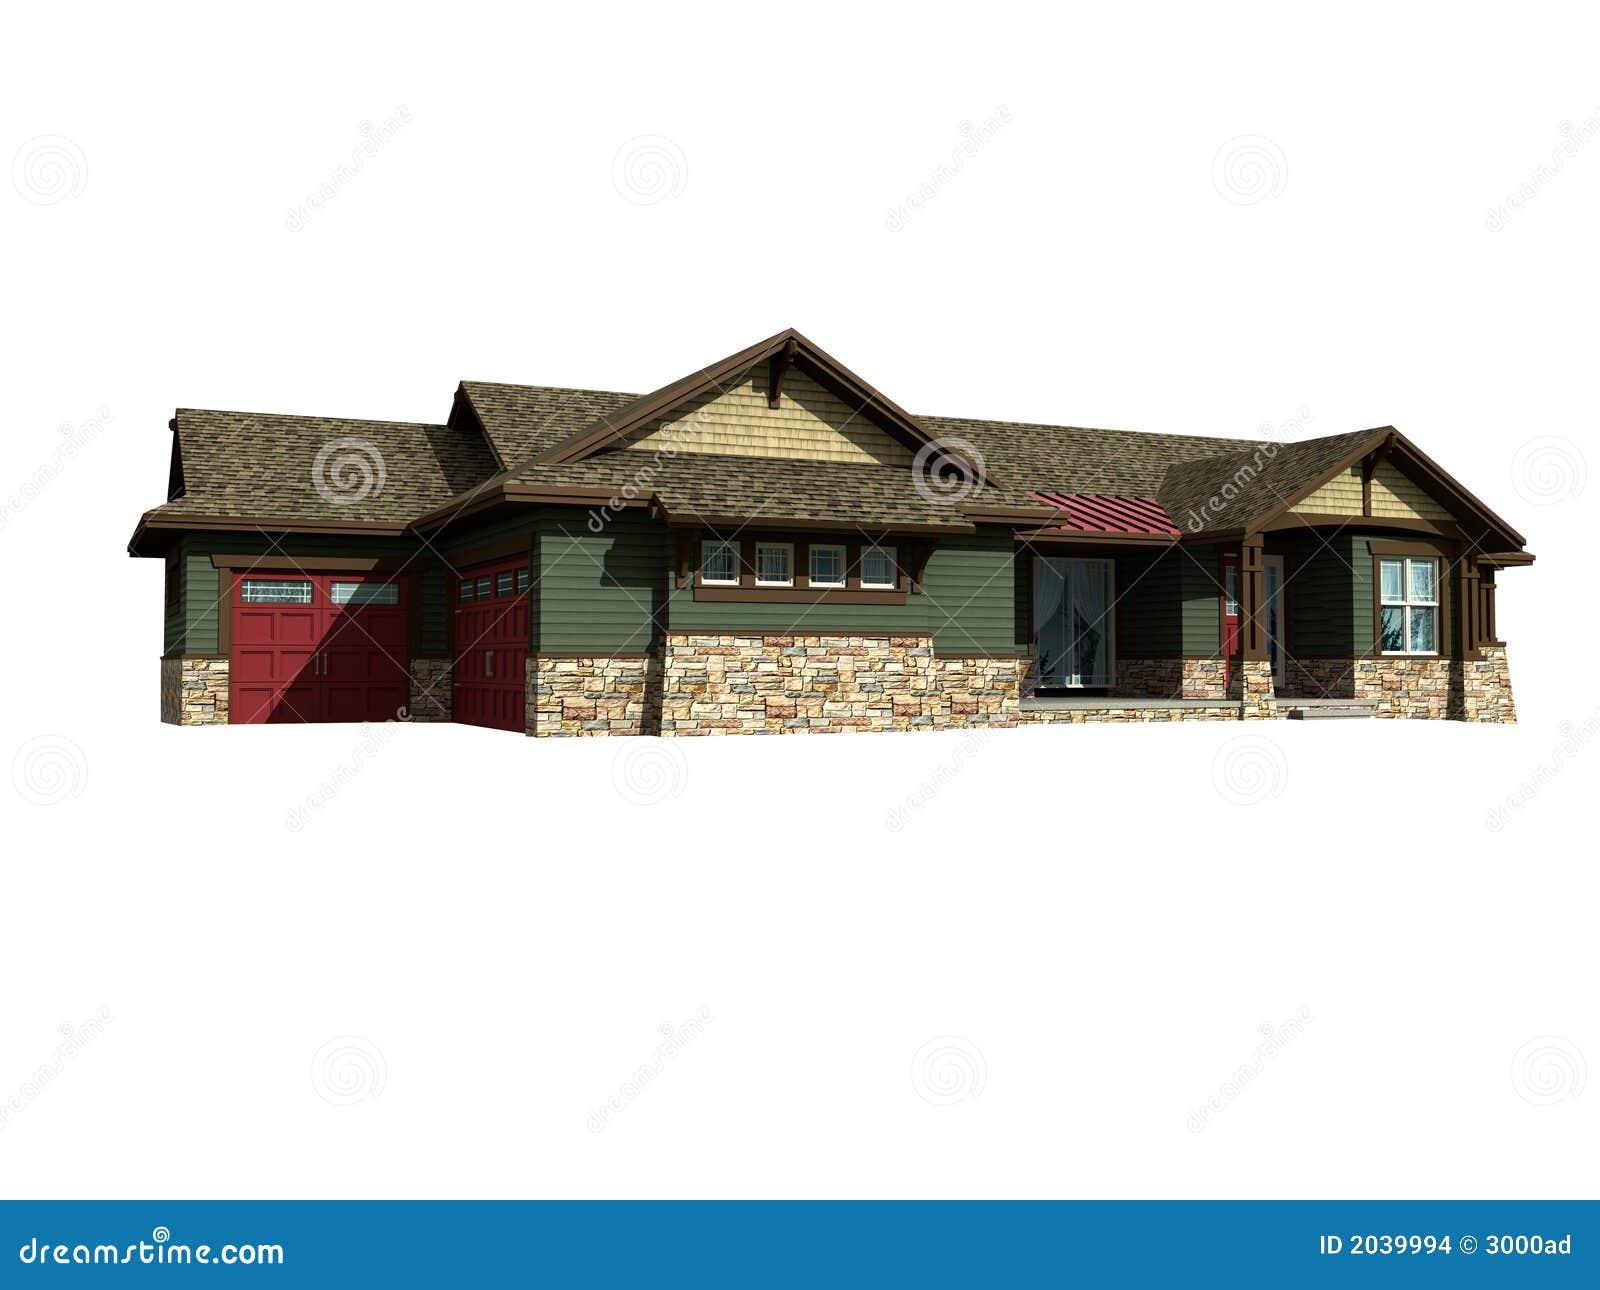 Modelo 3d de la casa de rancho imagenes de archivo for Modelo de casa en 3d